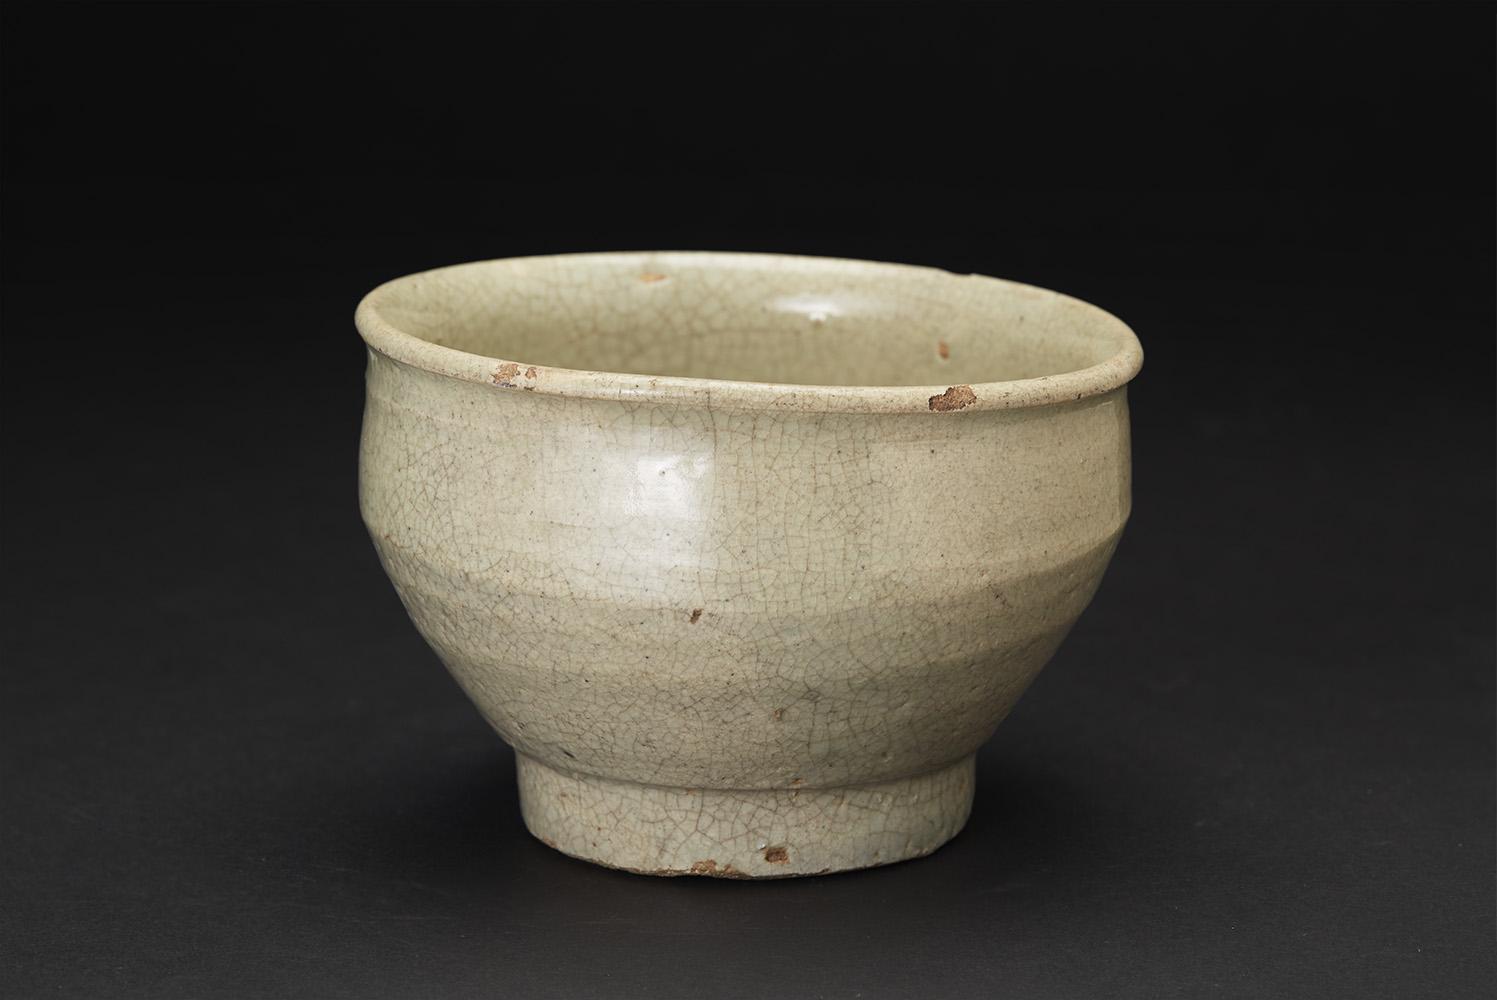 Korean Ceramics  Crackle Tea Bowl  , Early Chosun Period Ceramic 5.5 x 3.75 inches 14 x 9.5 cm KCer 9